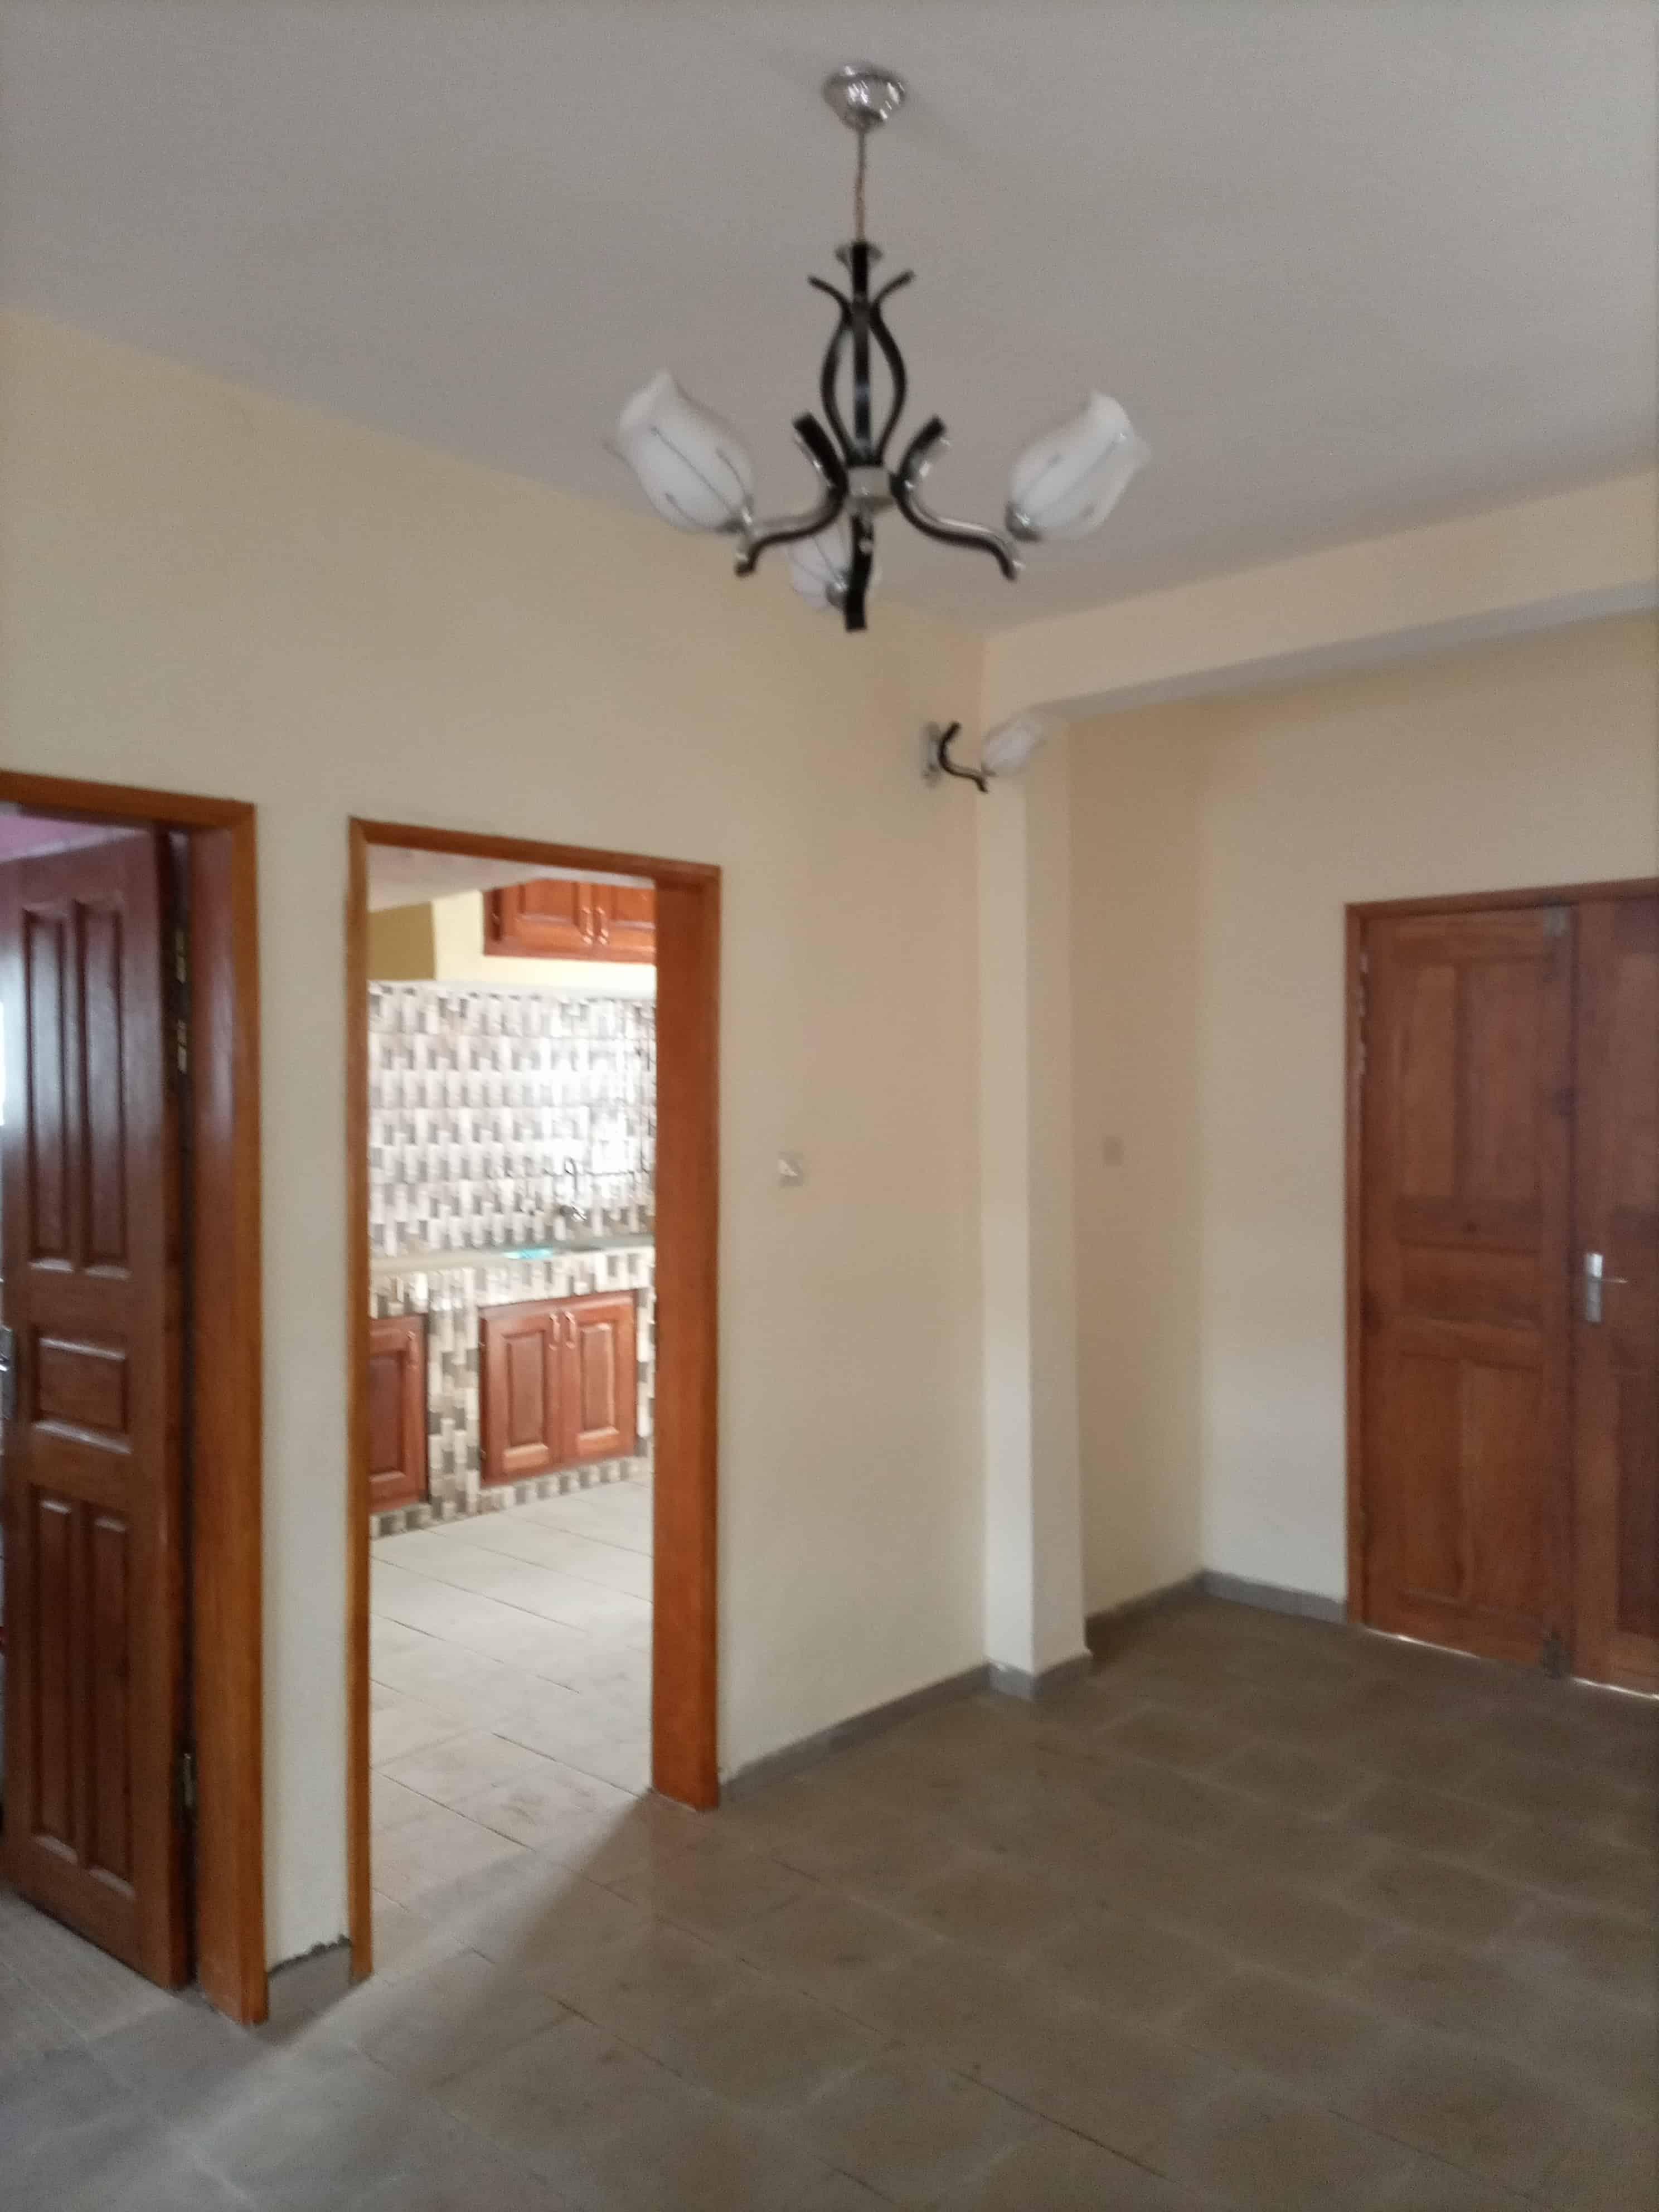 Apartment to rent - Douala, Logbessou I, Carrefour logbessou - 1 living room(s), 3 bedroom(s), 3 bathroom(s) - 150 000 FCFA / month